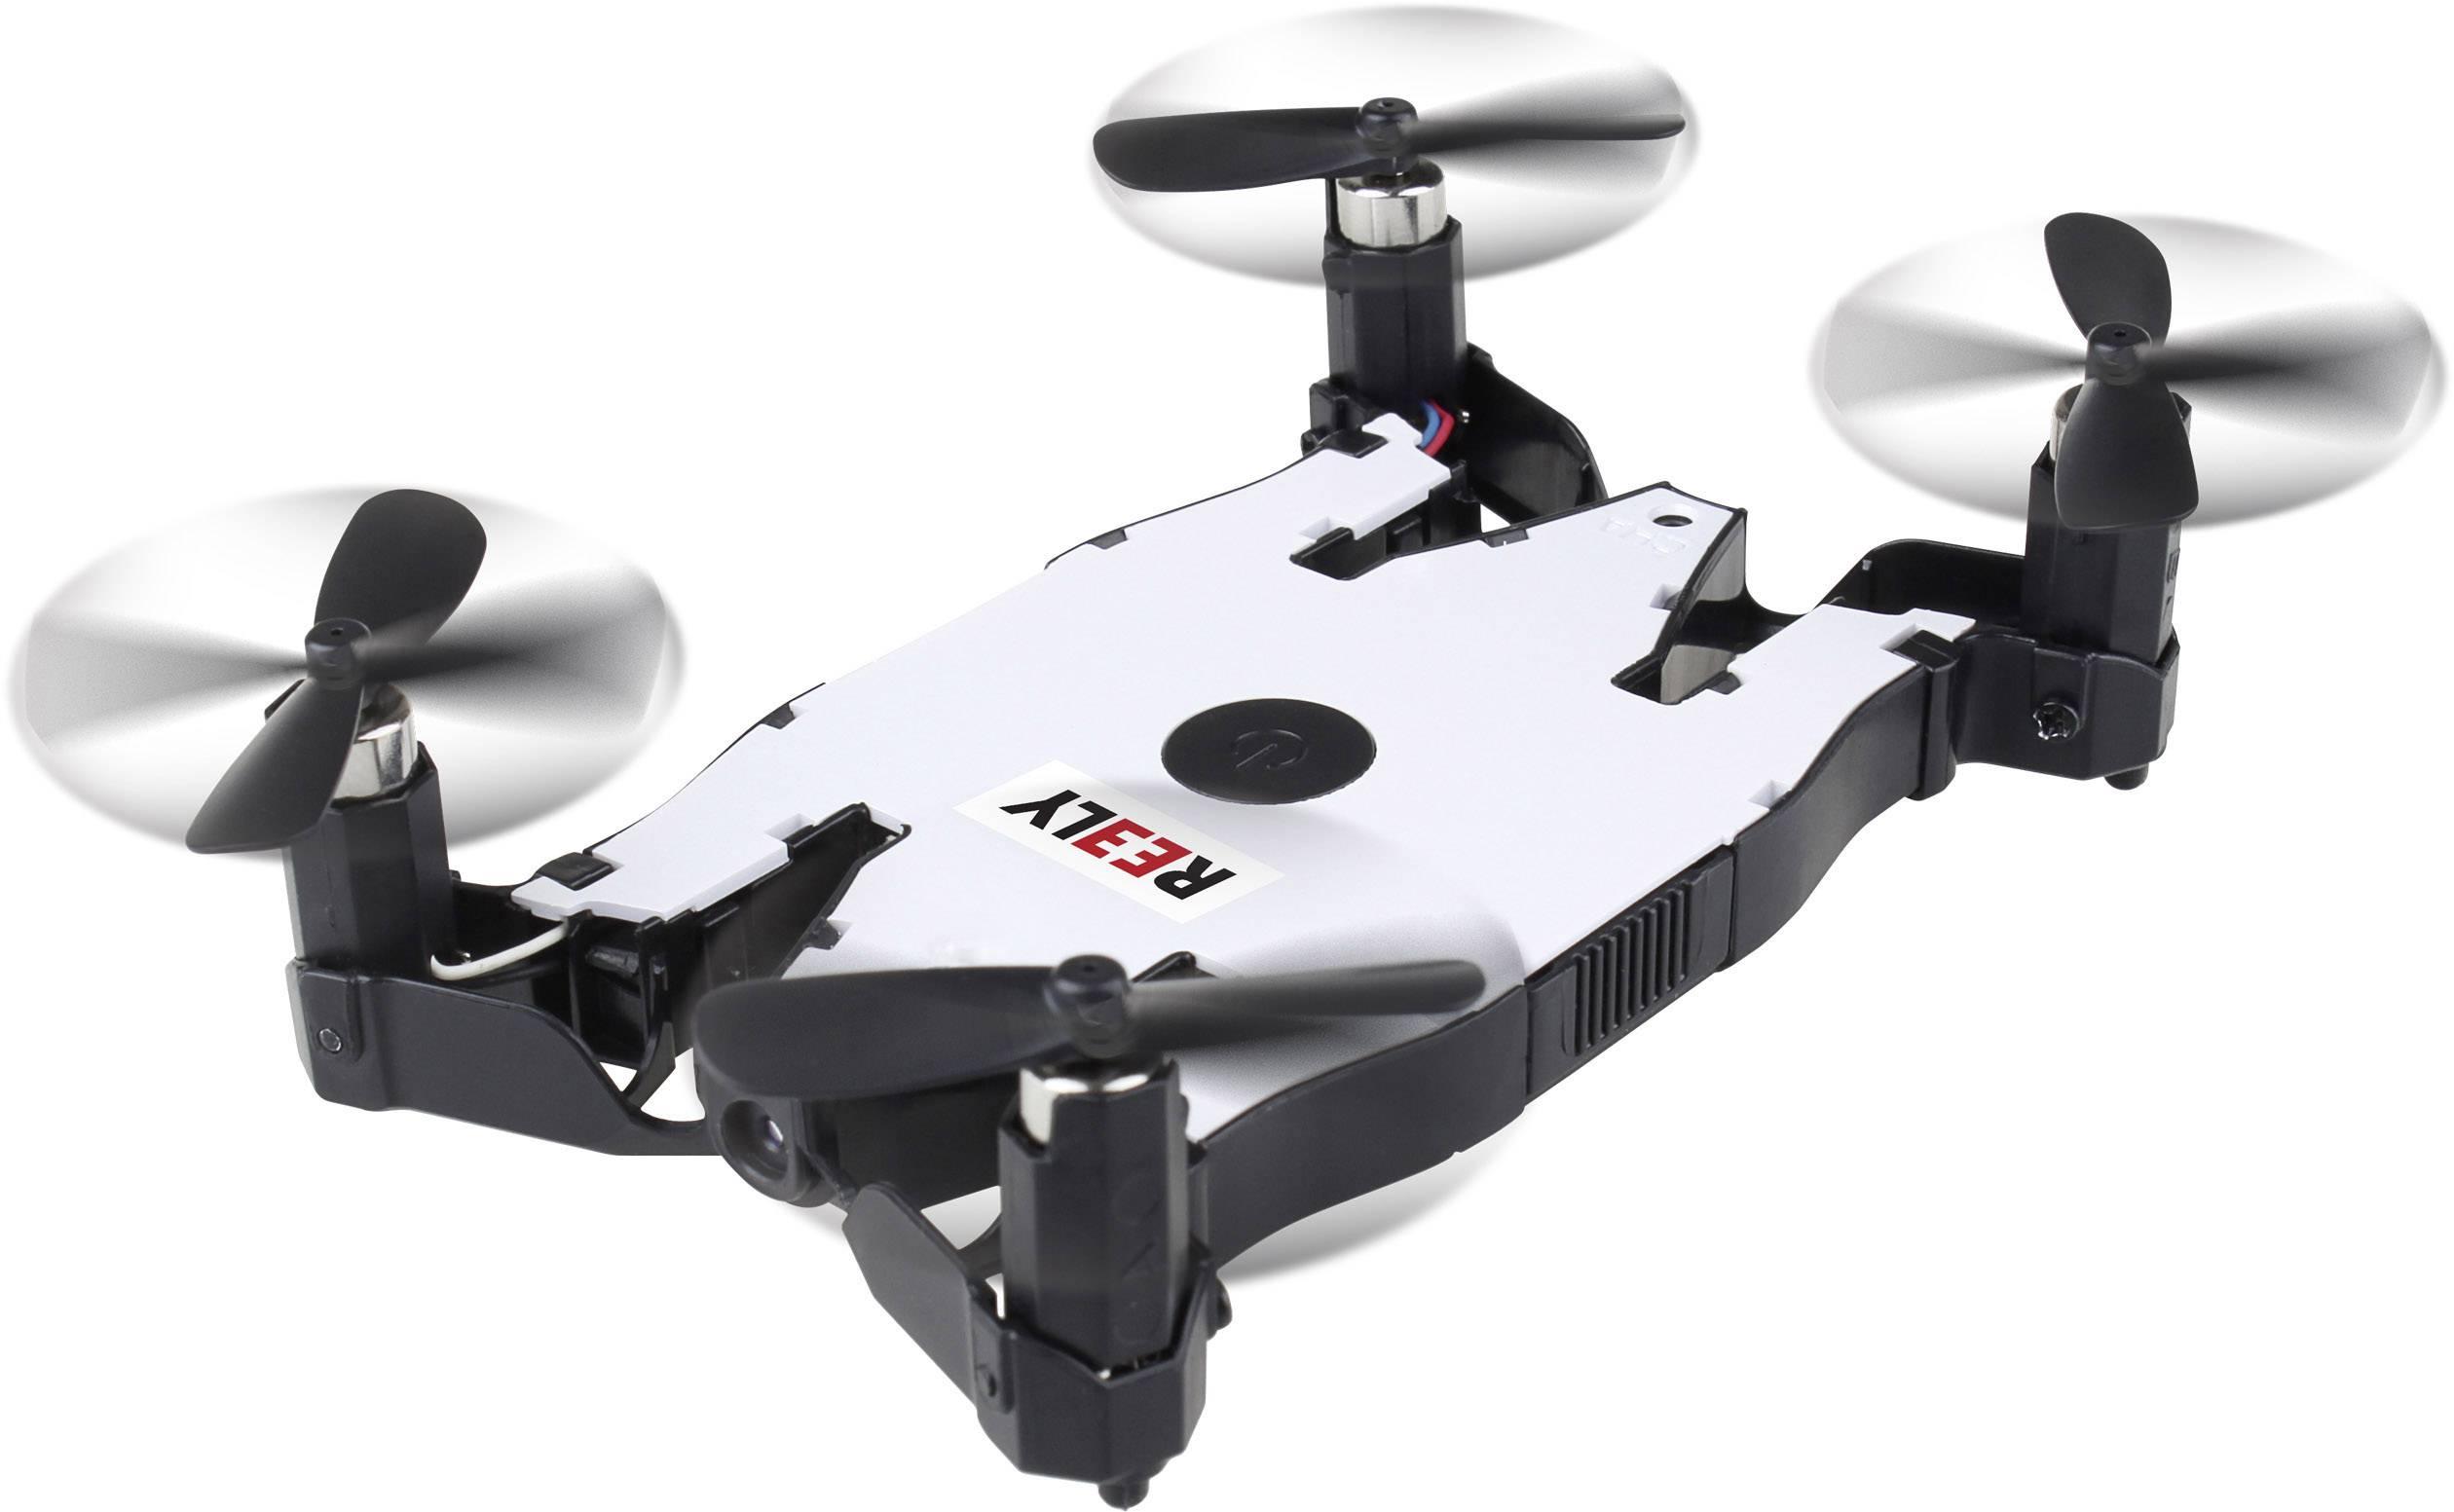 Reely Pocket Drone Quadricotte